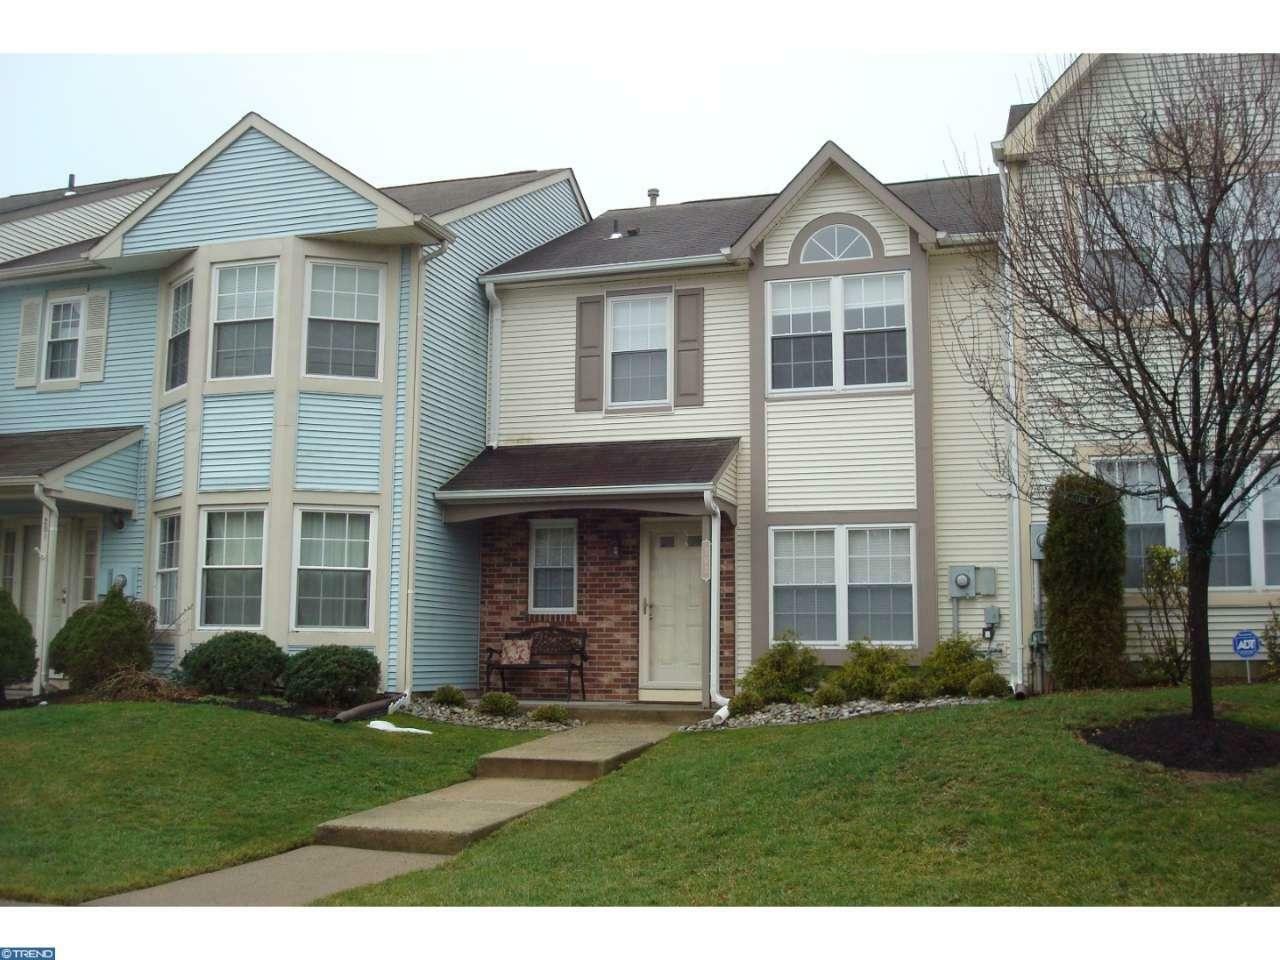 202 Waverly Ct, Robbinsville, NJ - USA (photo 1)